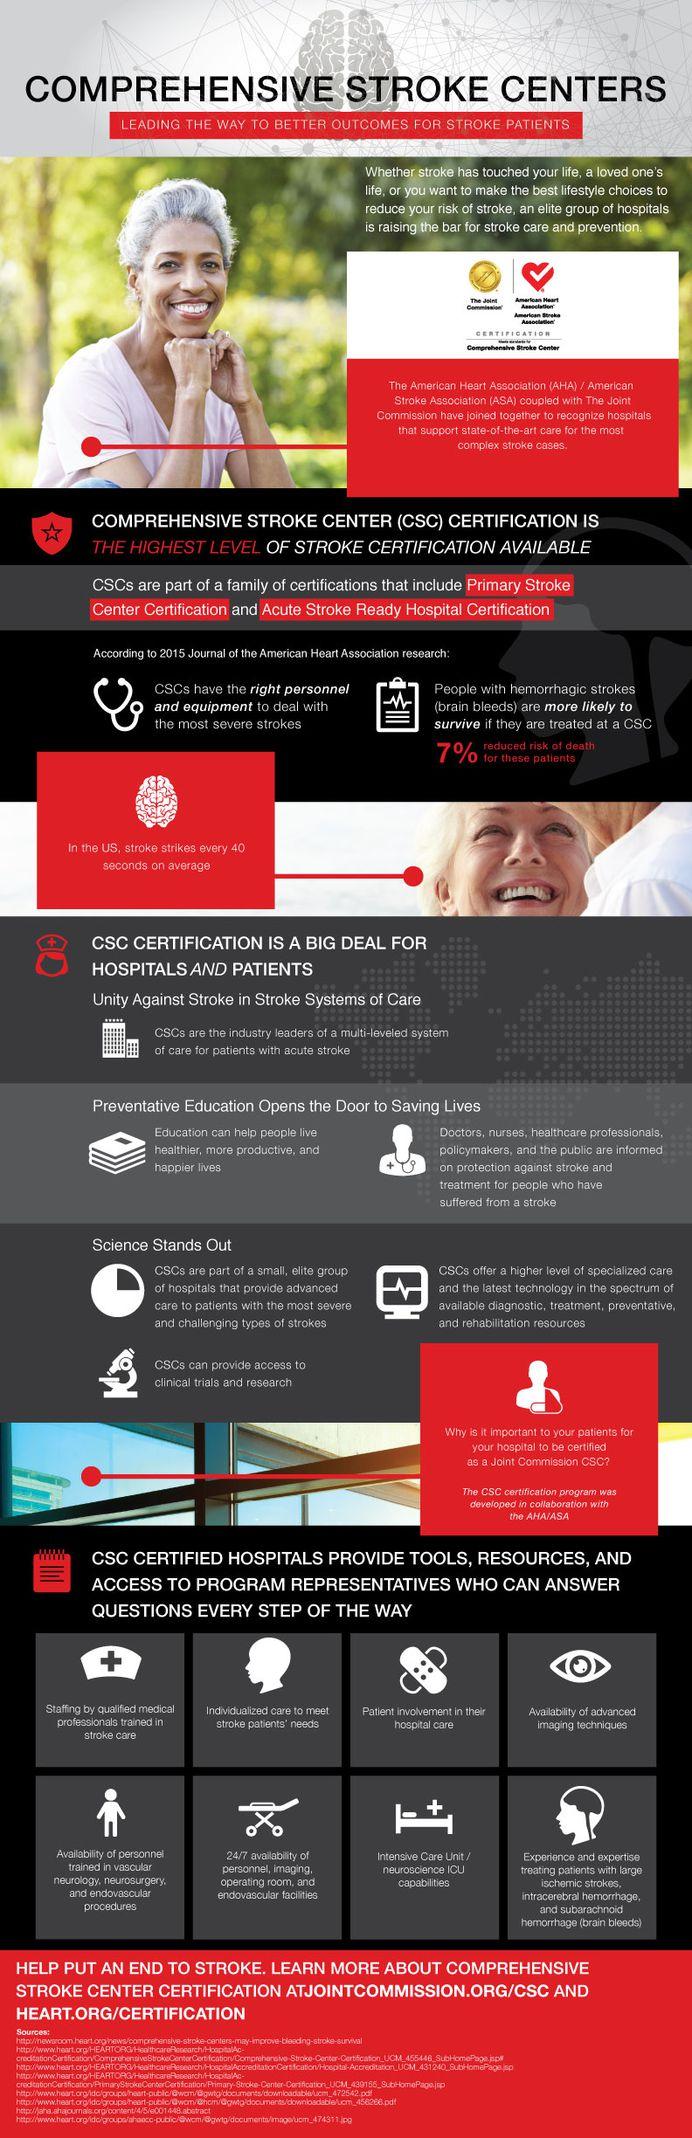 Comprehensive Stroke Centers Infographic